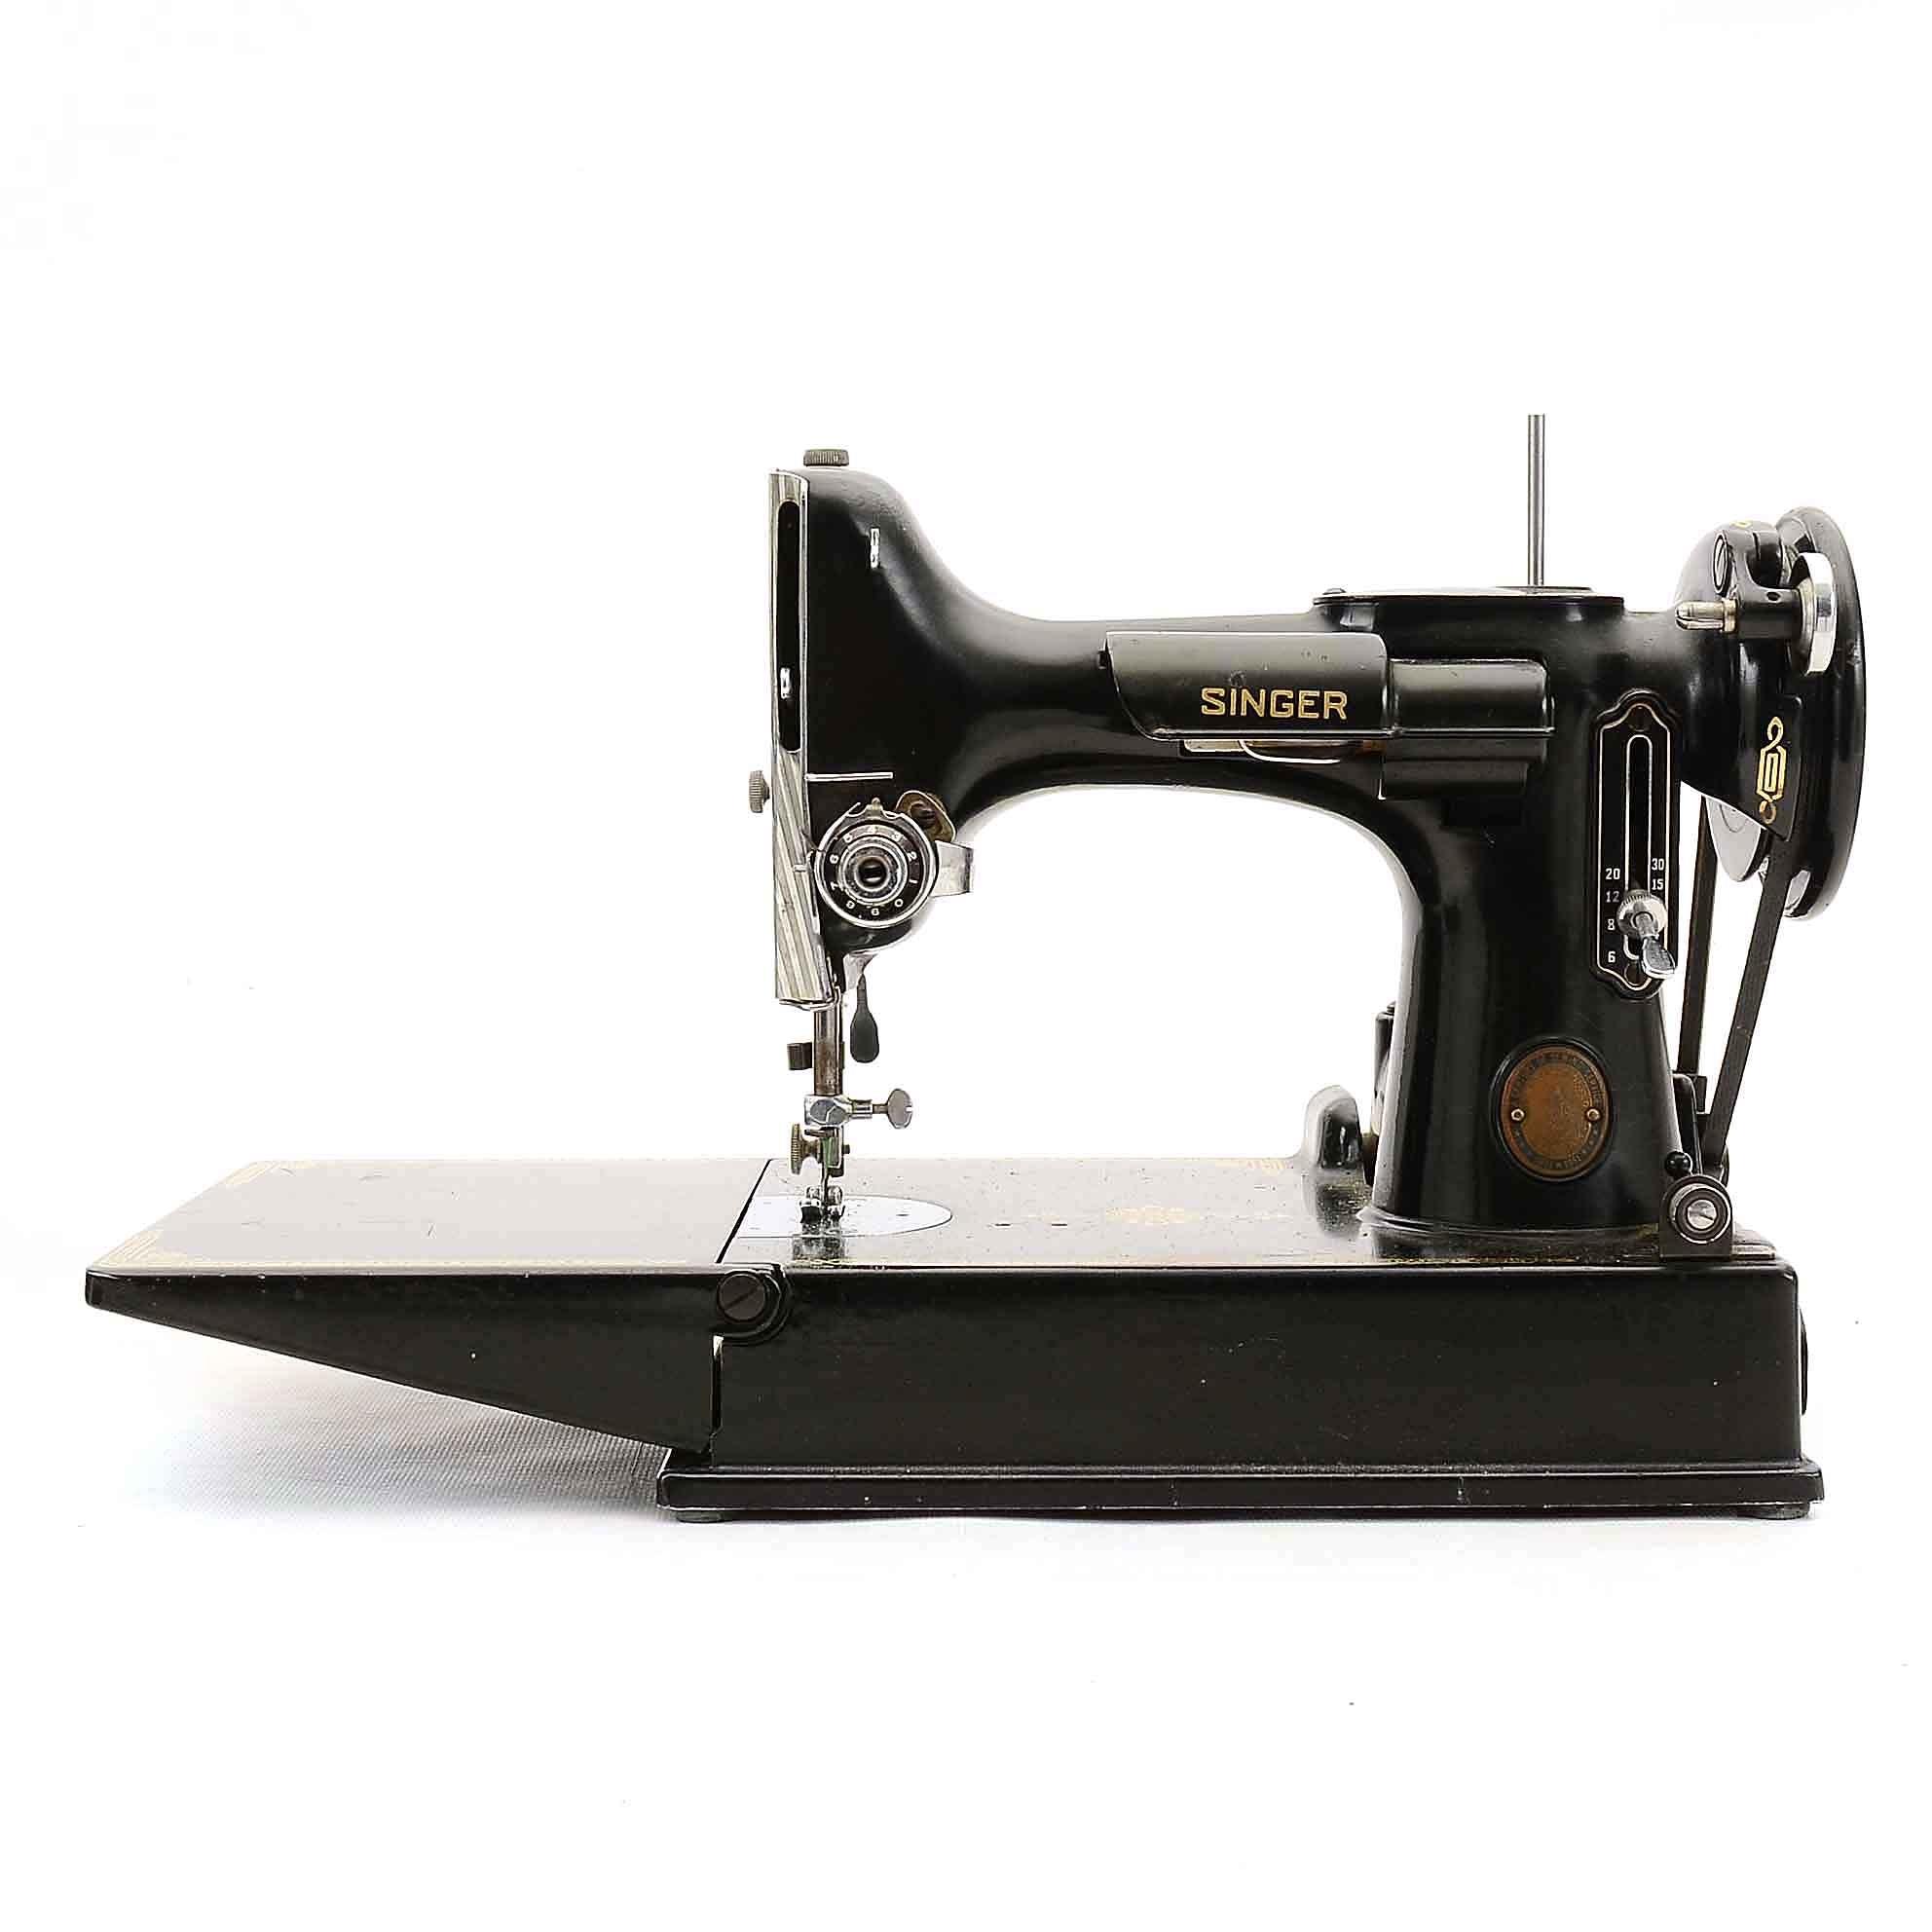 Vintage Portable Electric Singer Sewing Machine, Model 221-1